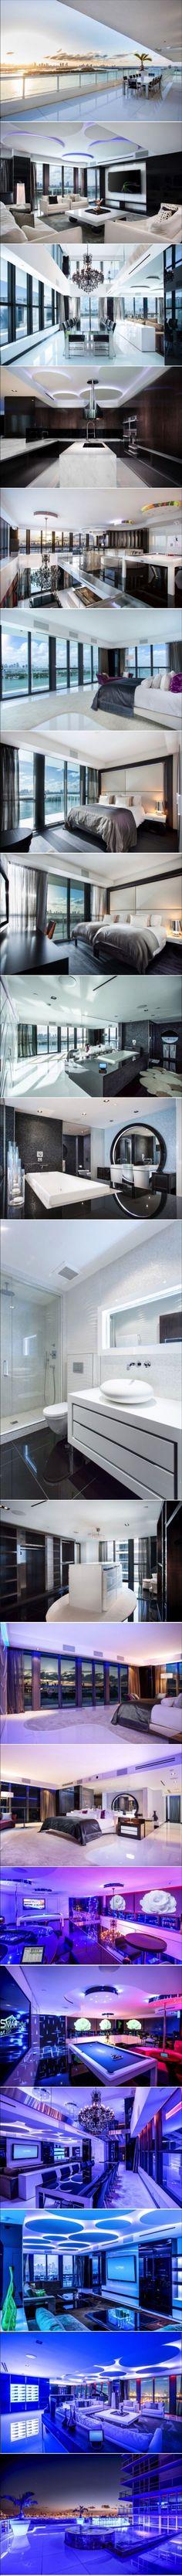 Bentley Bay's Essential Miami Beach Penthouse | HomeDSGN